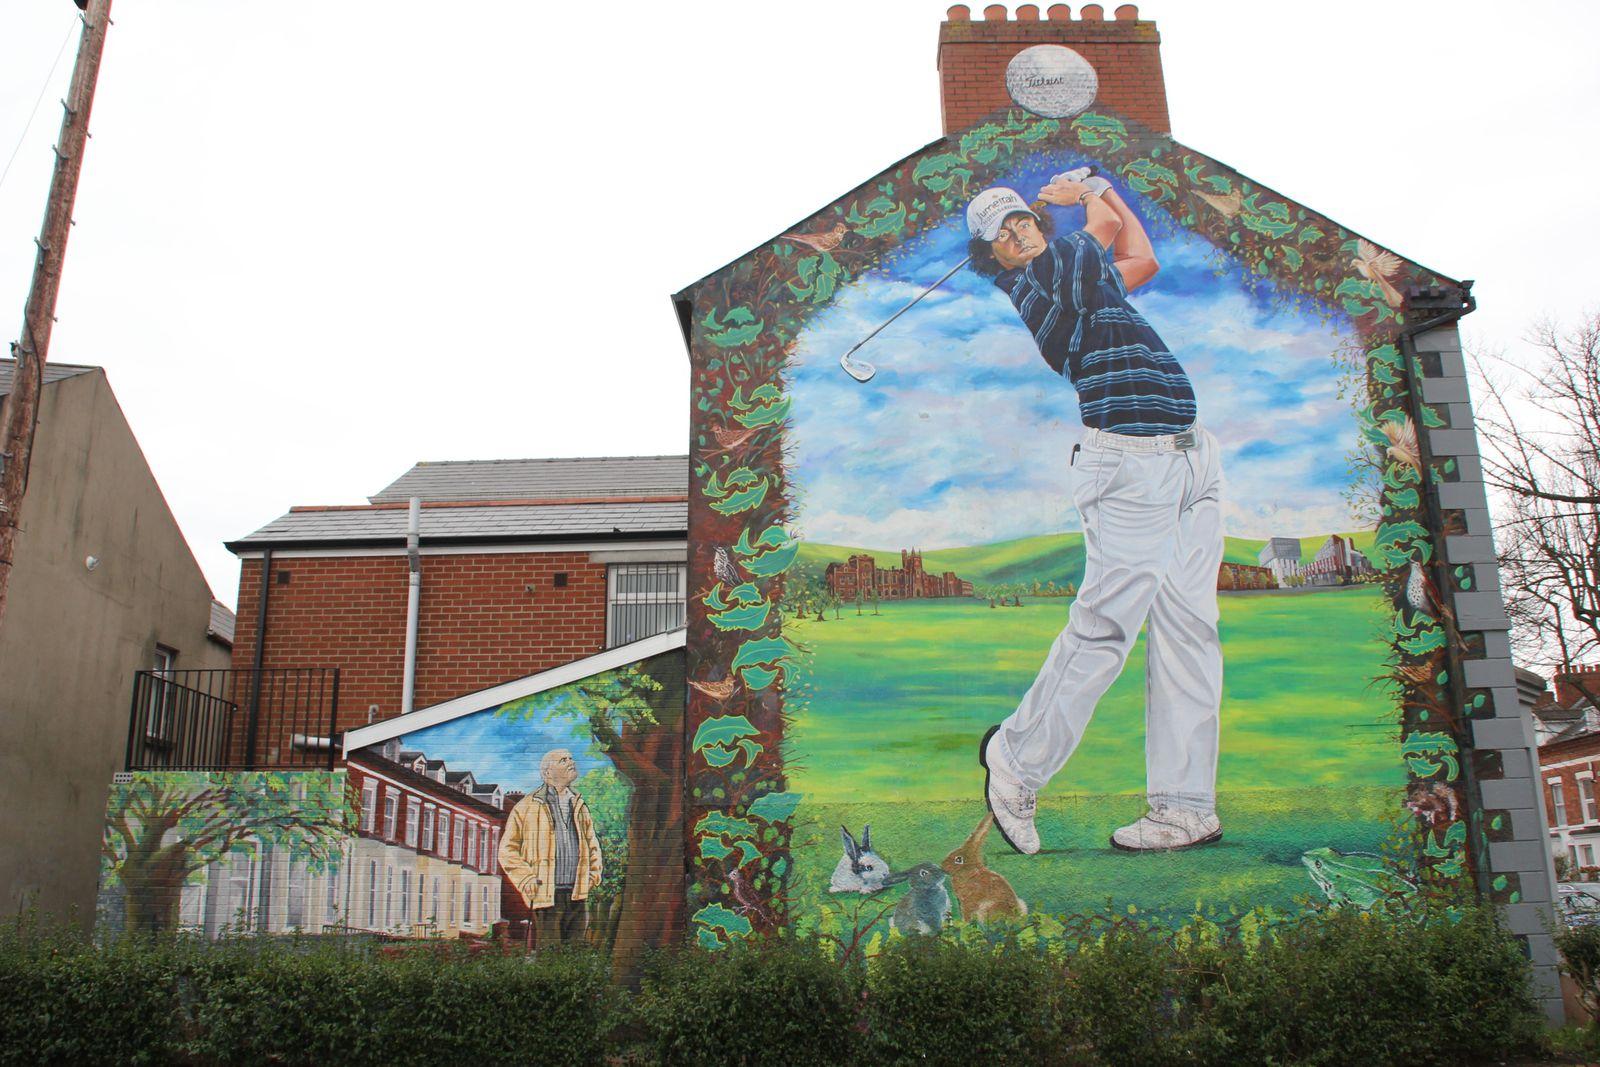 442) Damascus Street, South Belfast